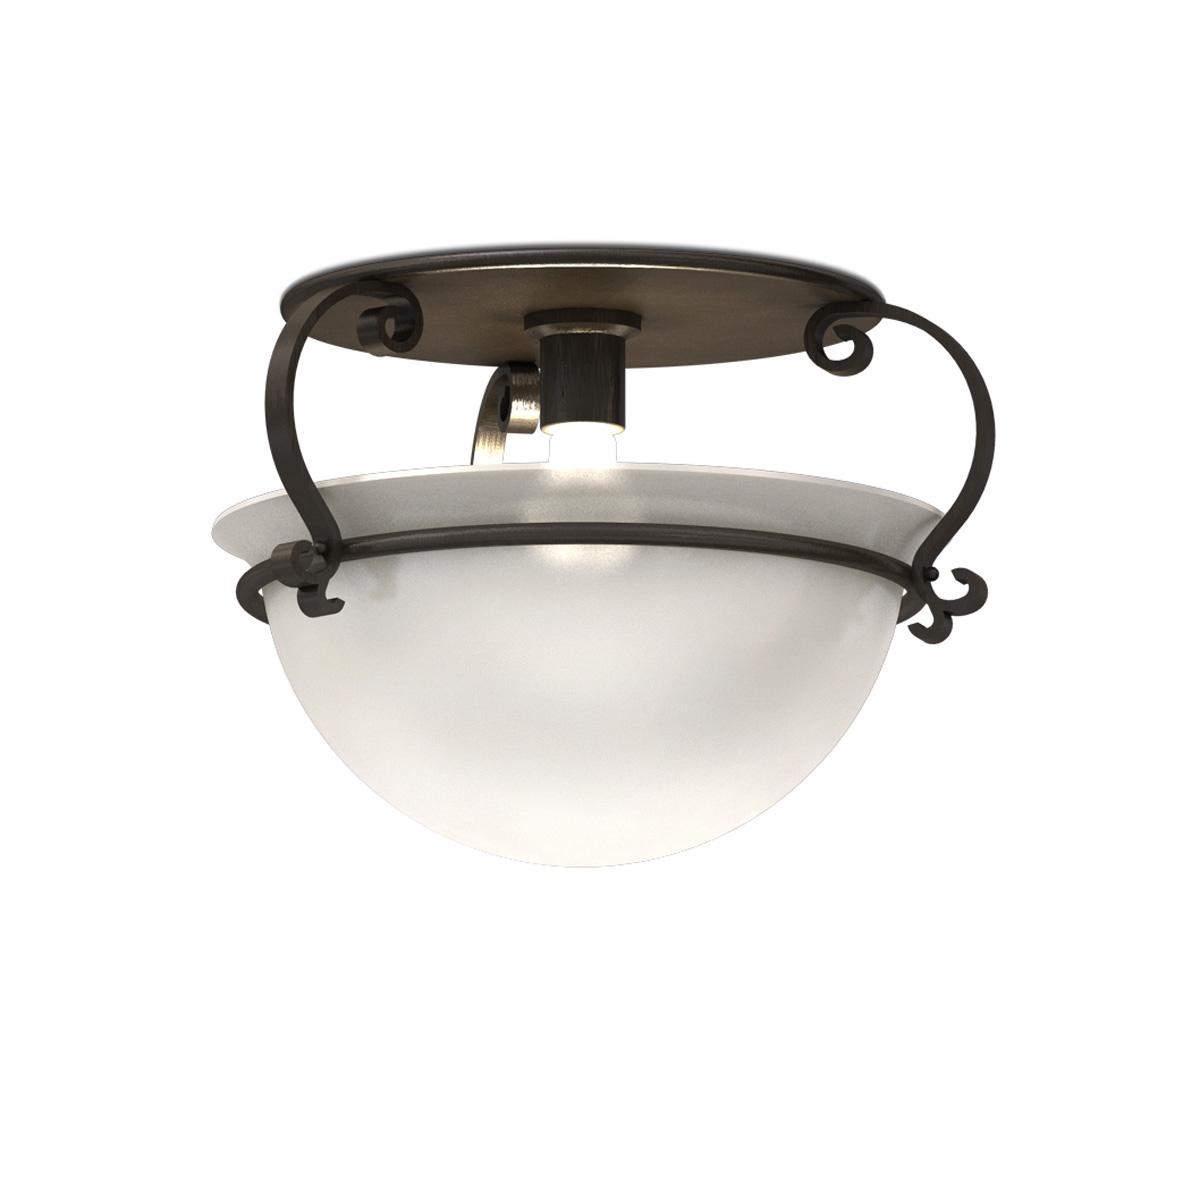 Artisan Lindos Semi-Flush Ceiling Bowl